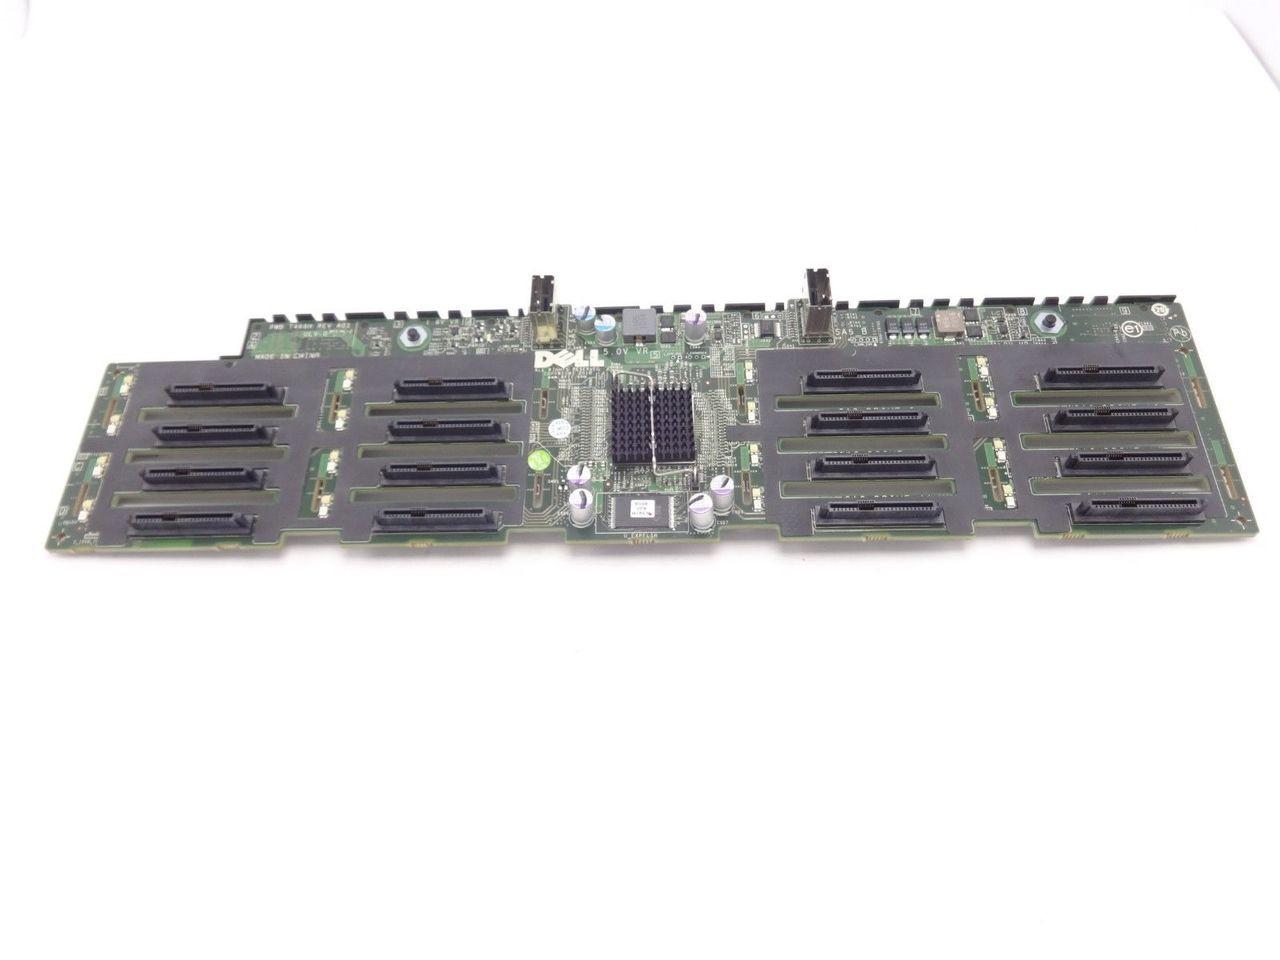 Dell J565K Poweredge R910 2.5 x 16 Backplane